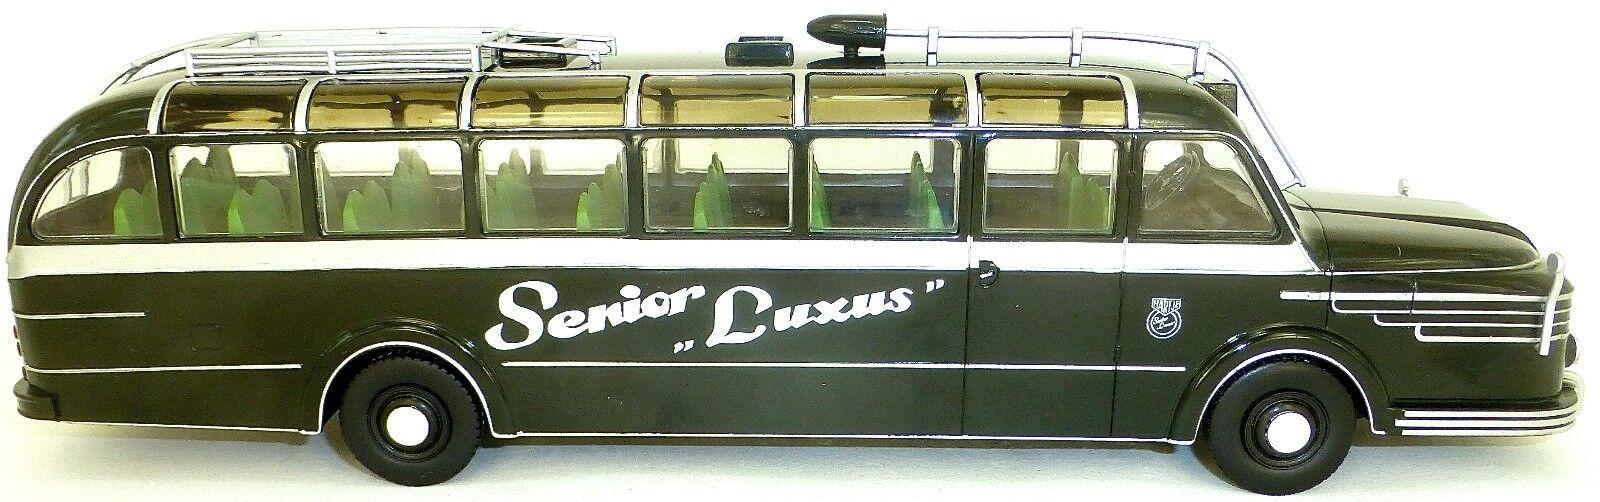 Krupp Titan 080 Senior Luxus Hartje 1951 Bus Ixo 1 43 Neuf et Emballé  ACBUS038